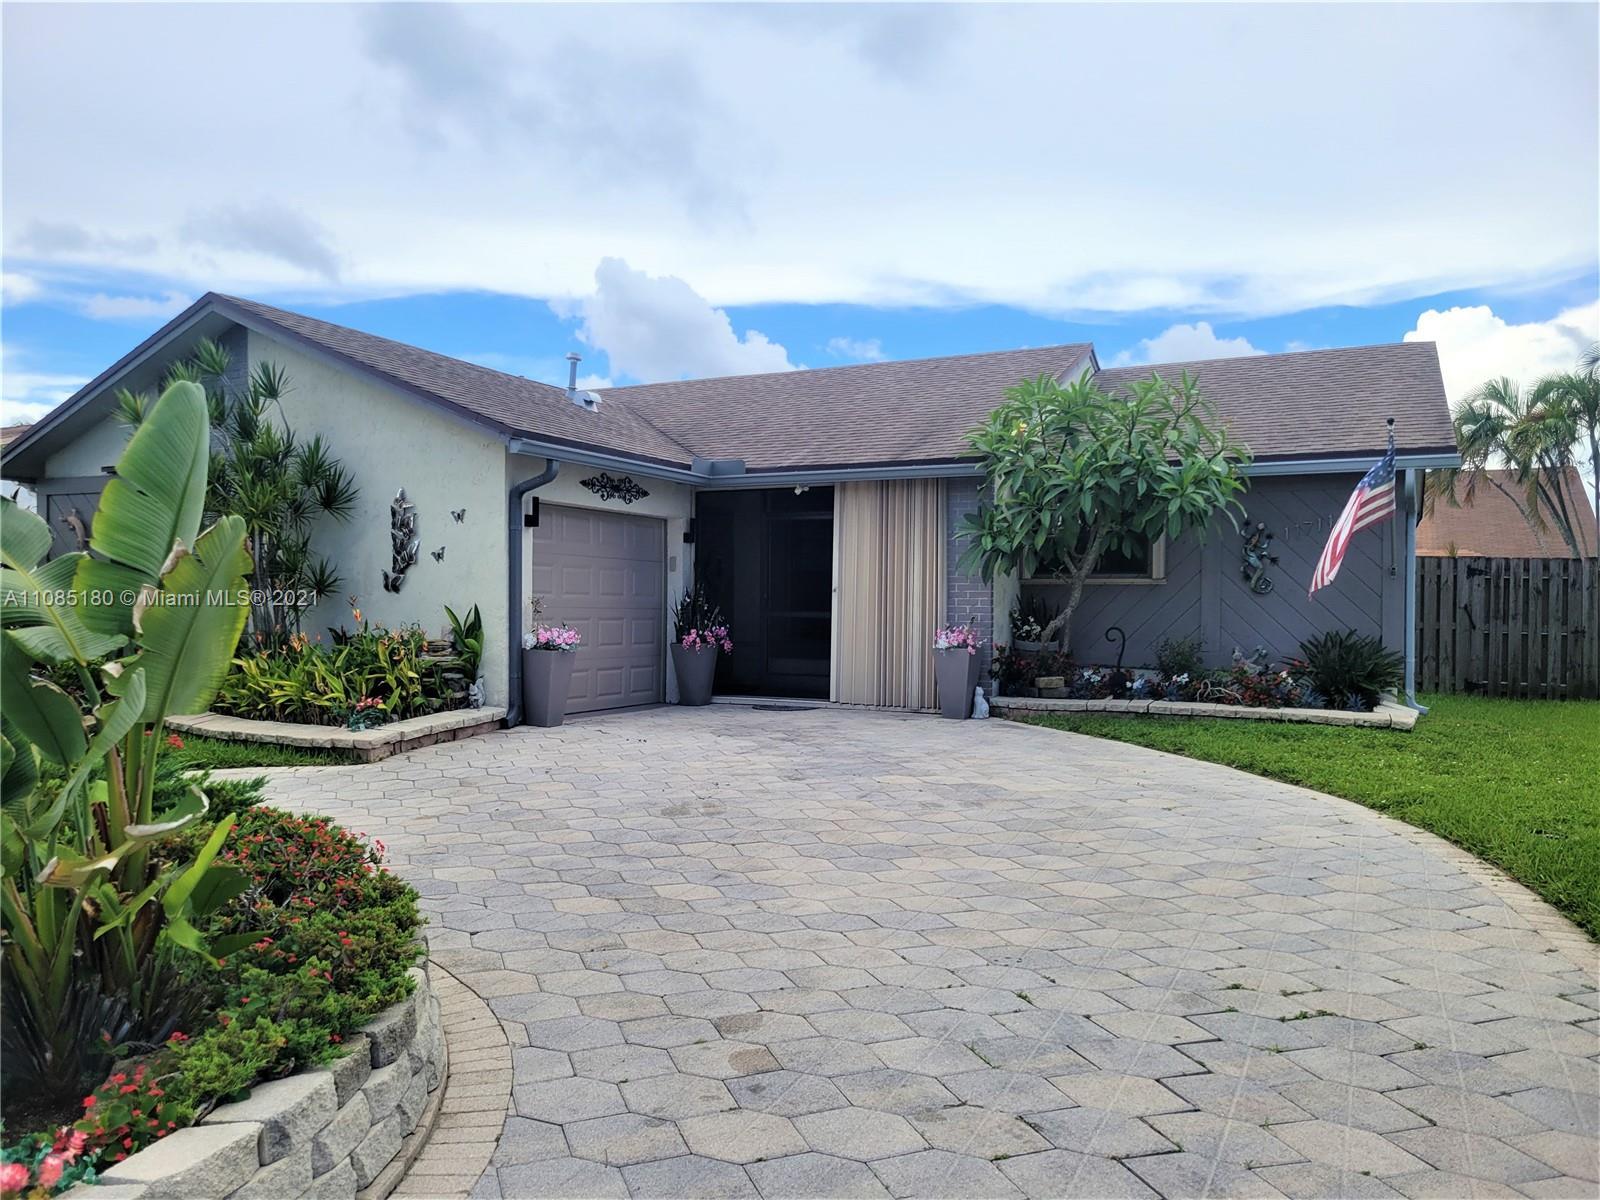 Sunrise Golf Village - 11711 NW 37th Pl, Sunrise, FL 33323